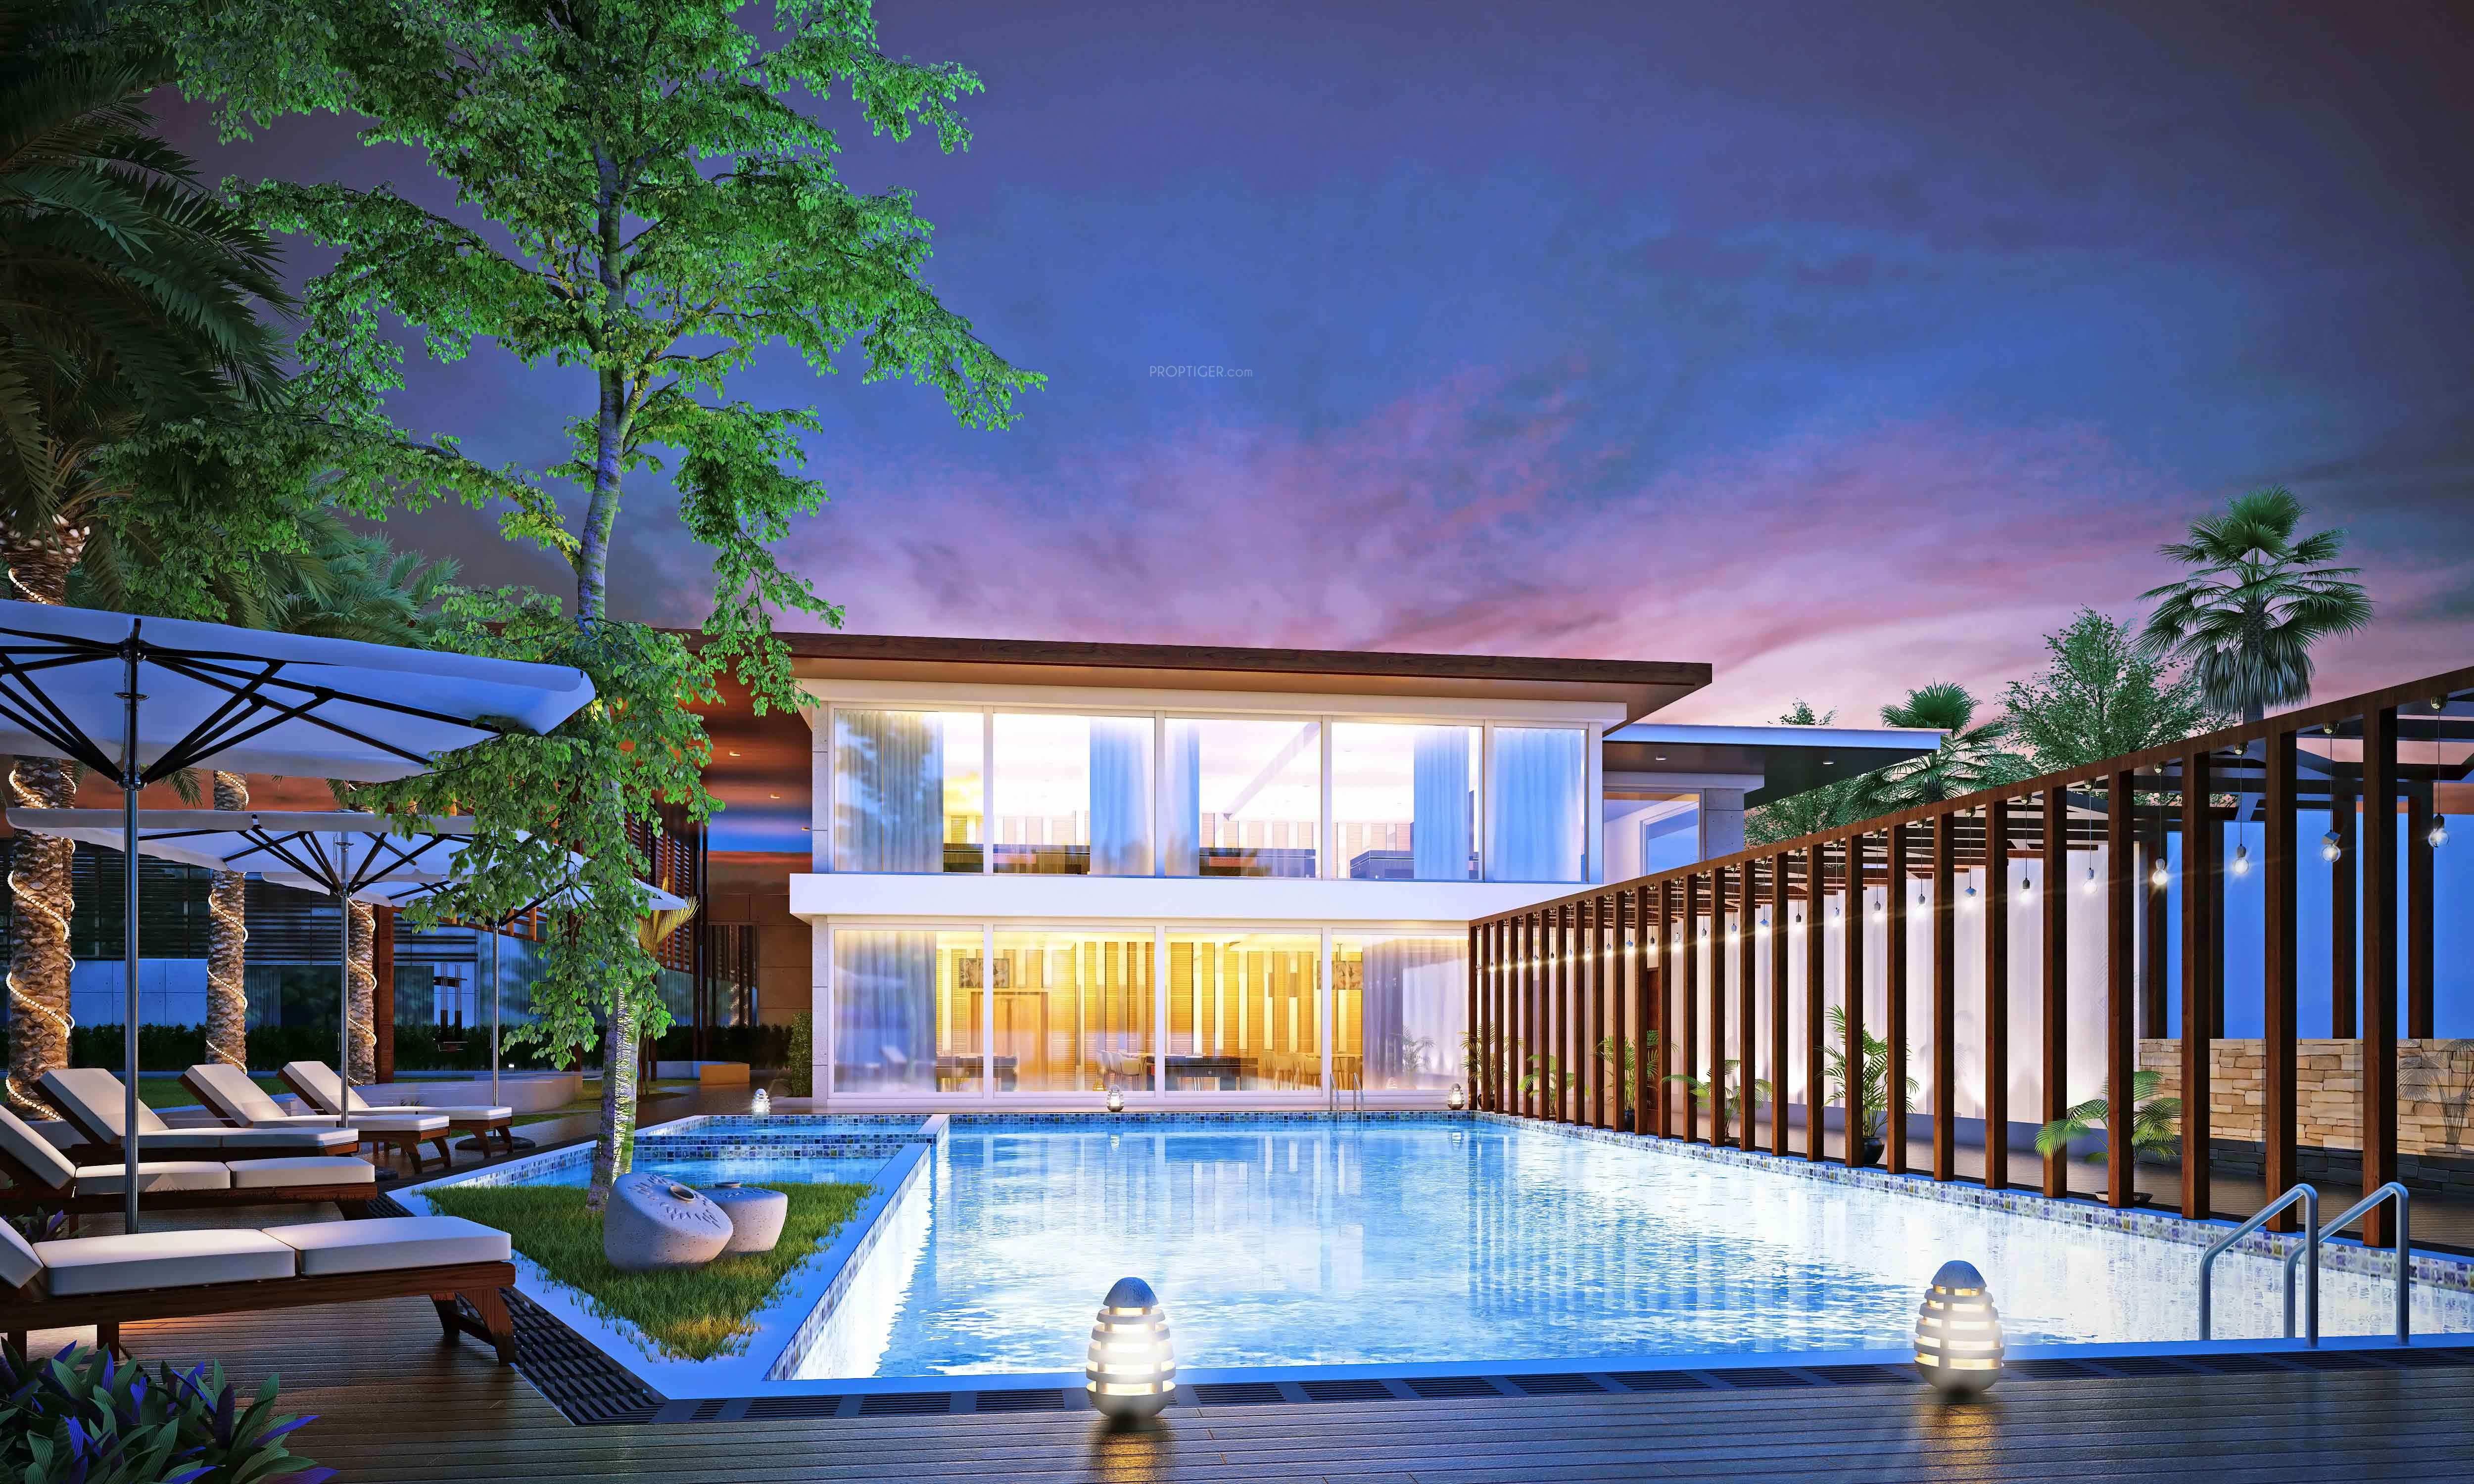 Eipl la paloma villas in mokila hyderabad price - Swimming pool construction cost in hyderabad ...